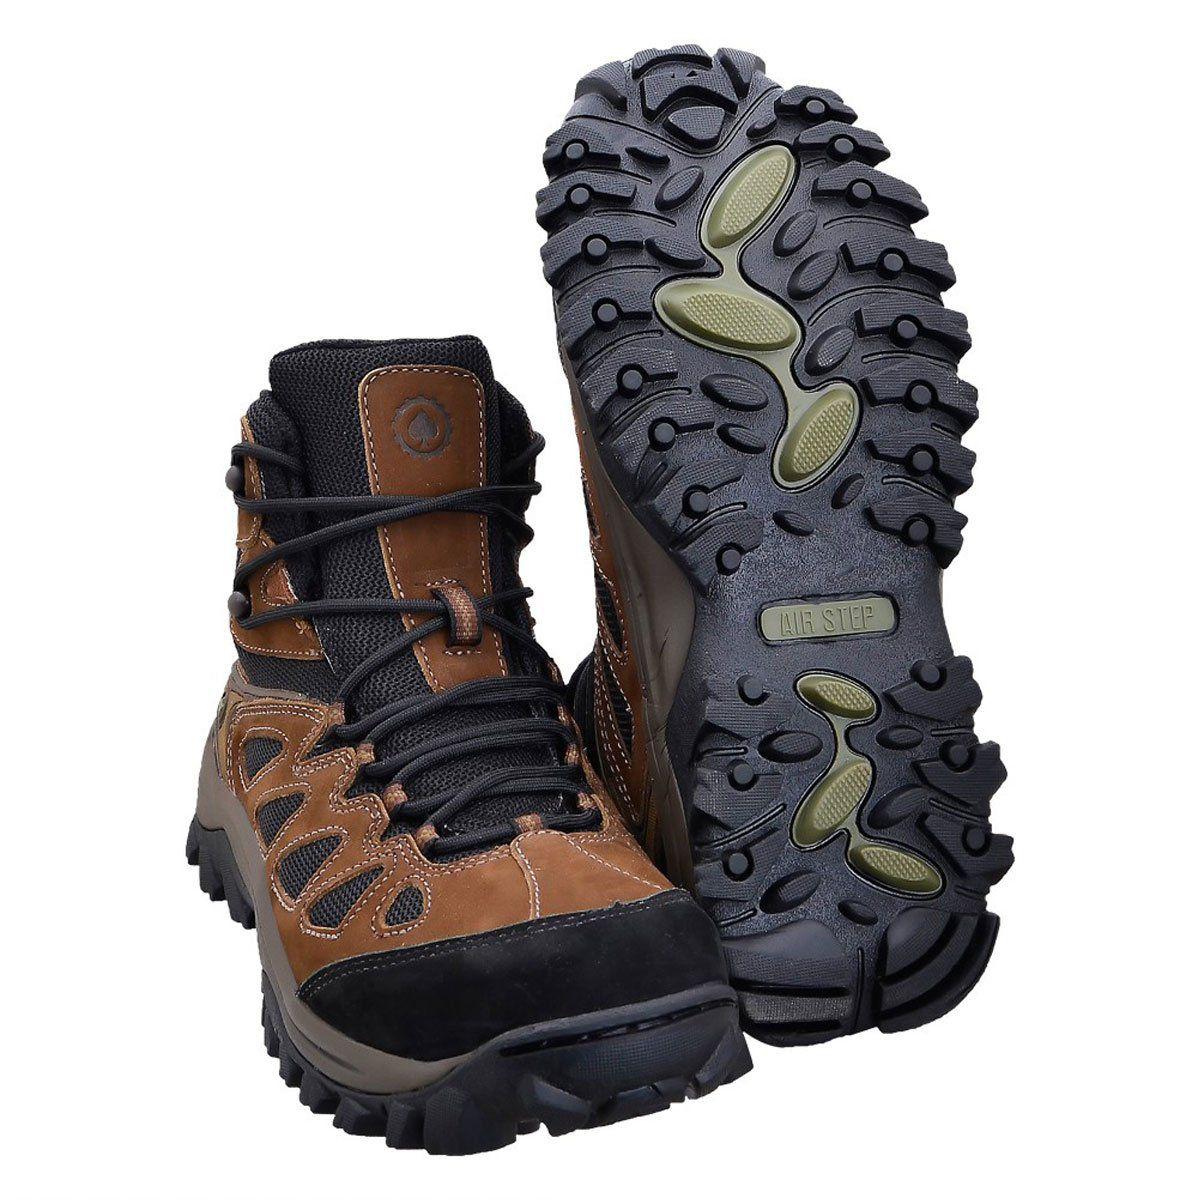 Bota Airstep Hiking Boot Brown Black